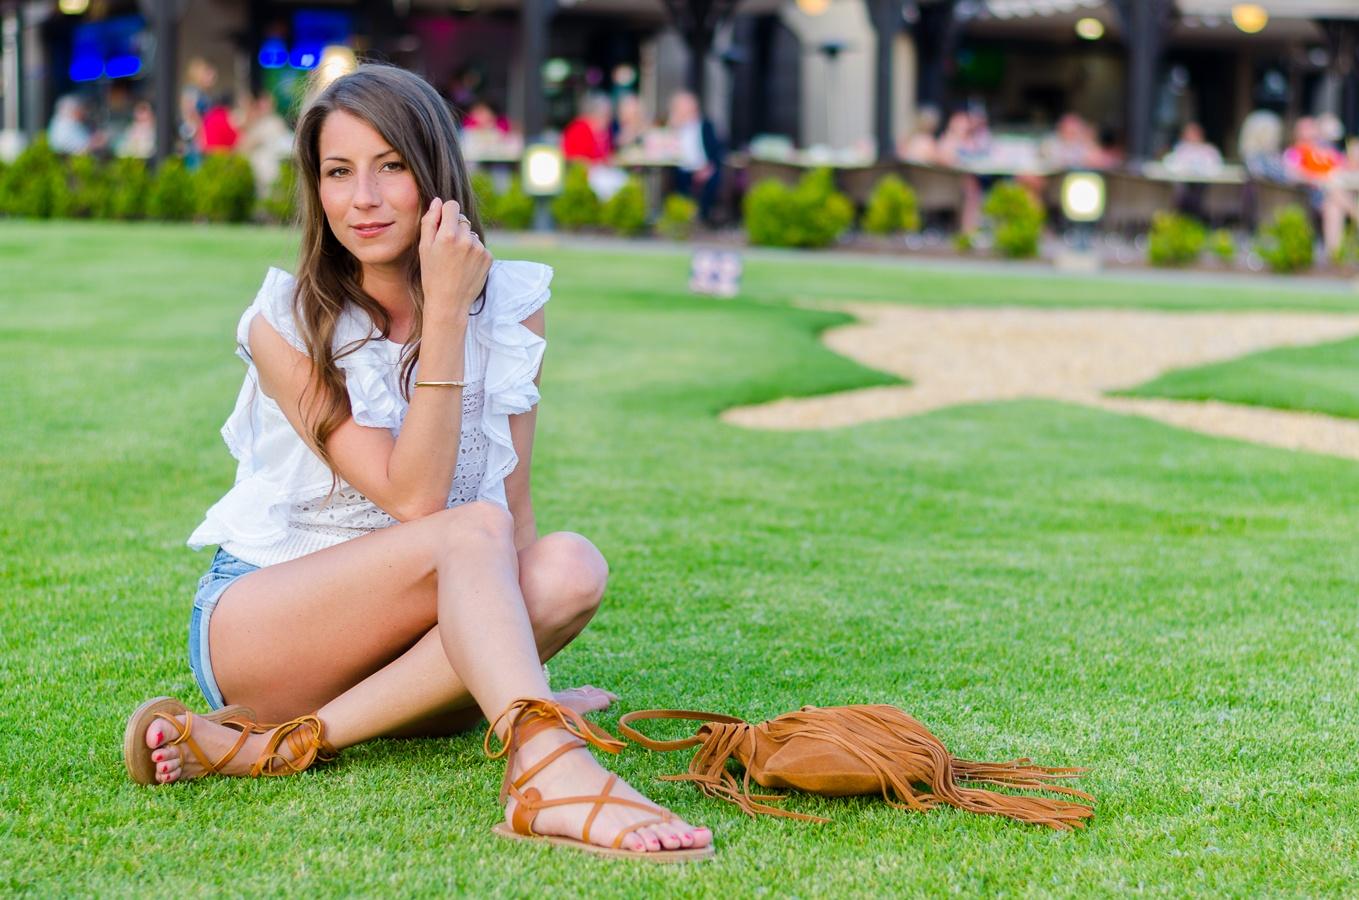 gladiator sandals isabel marant fashion blog summer look